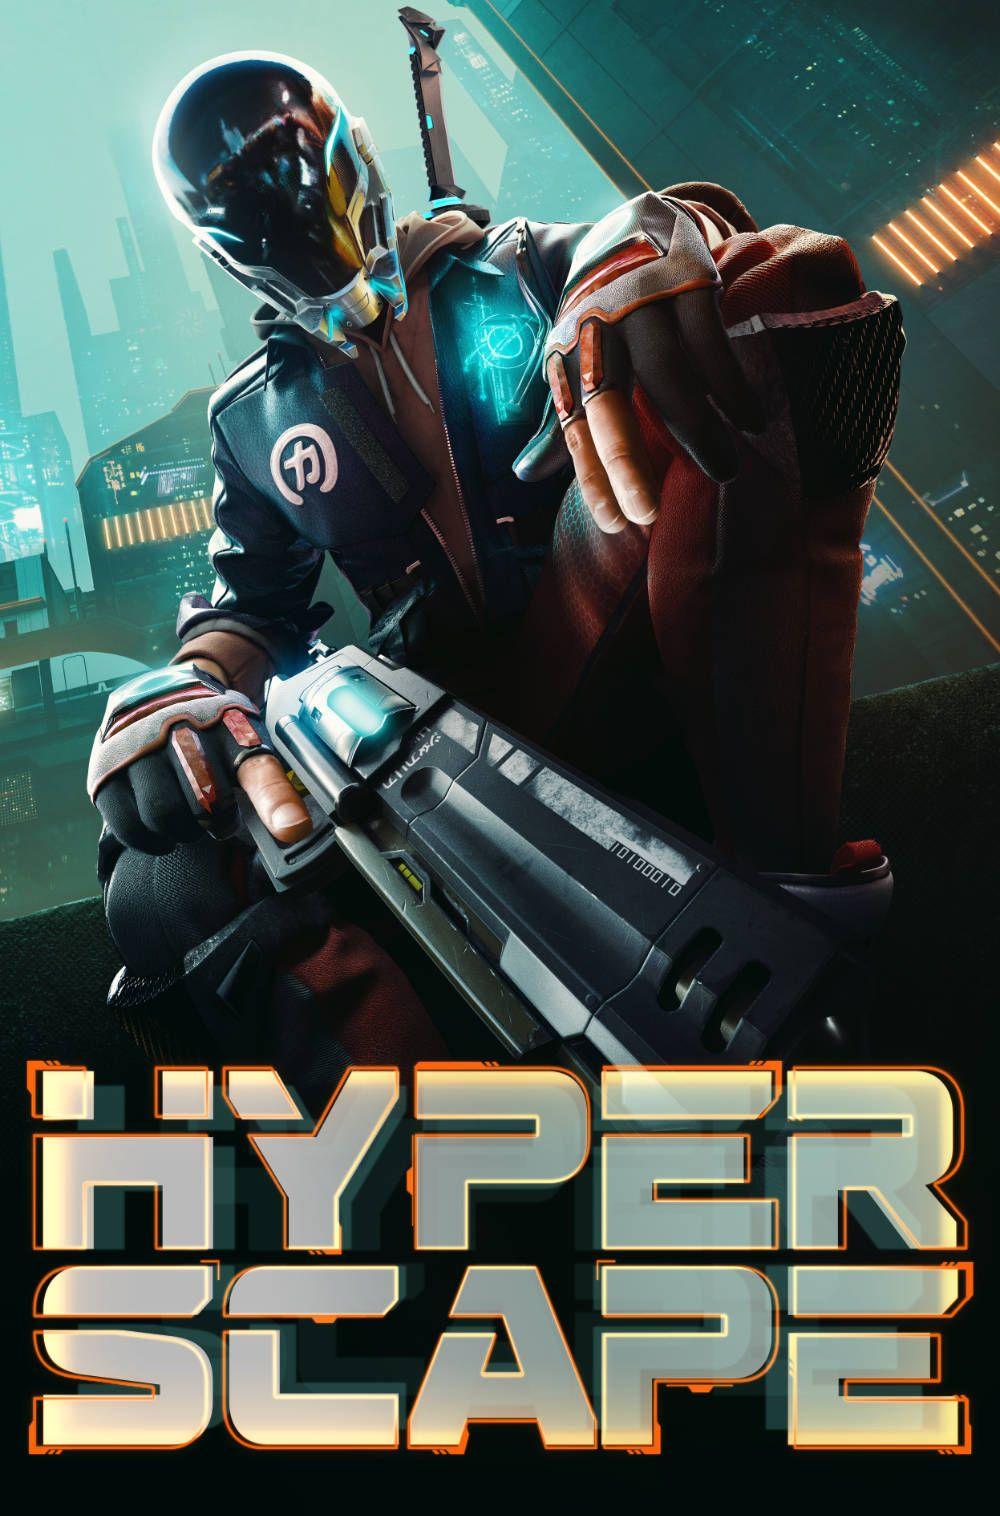 Ubisoft Reveals Hyper Scape, A Futuristic SquadBased